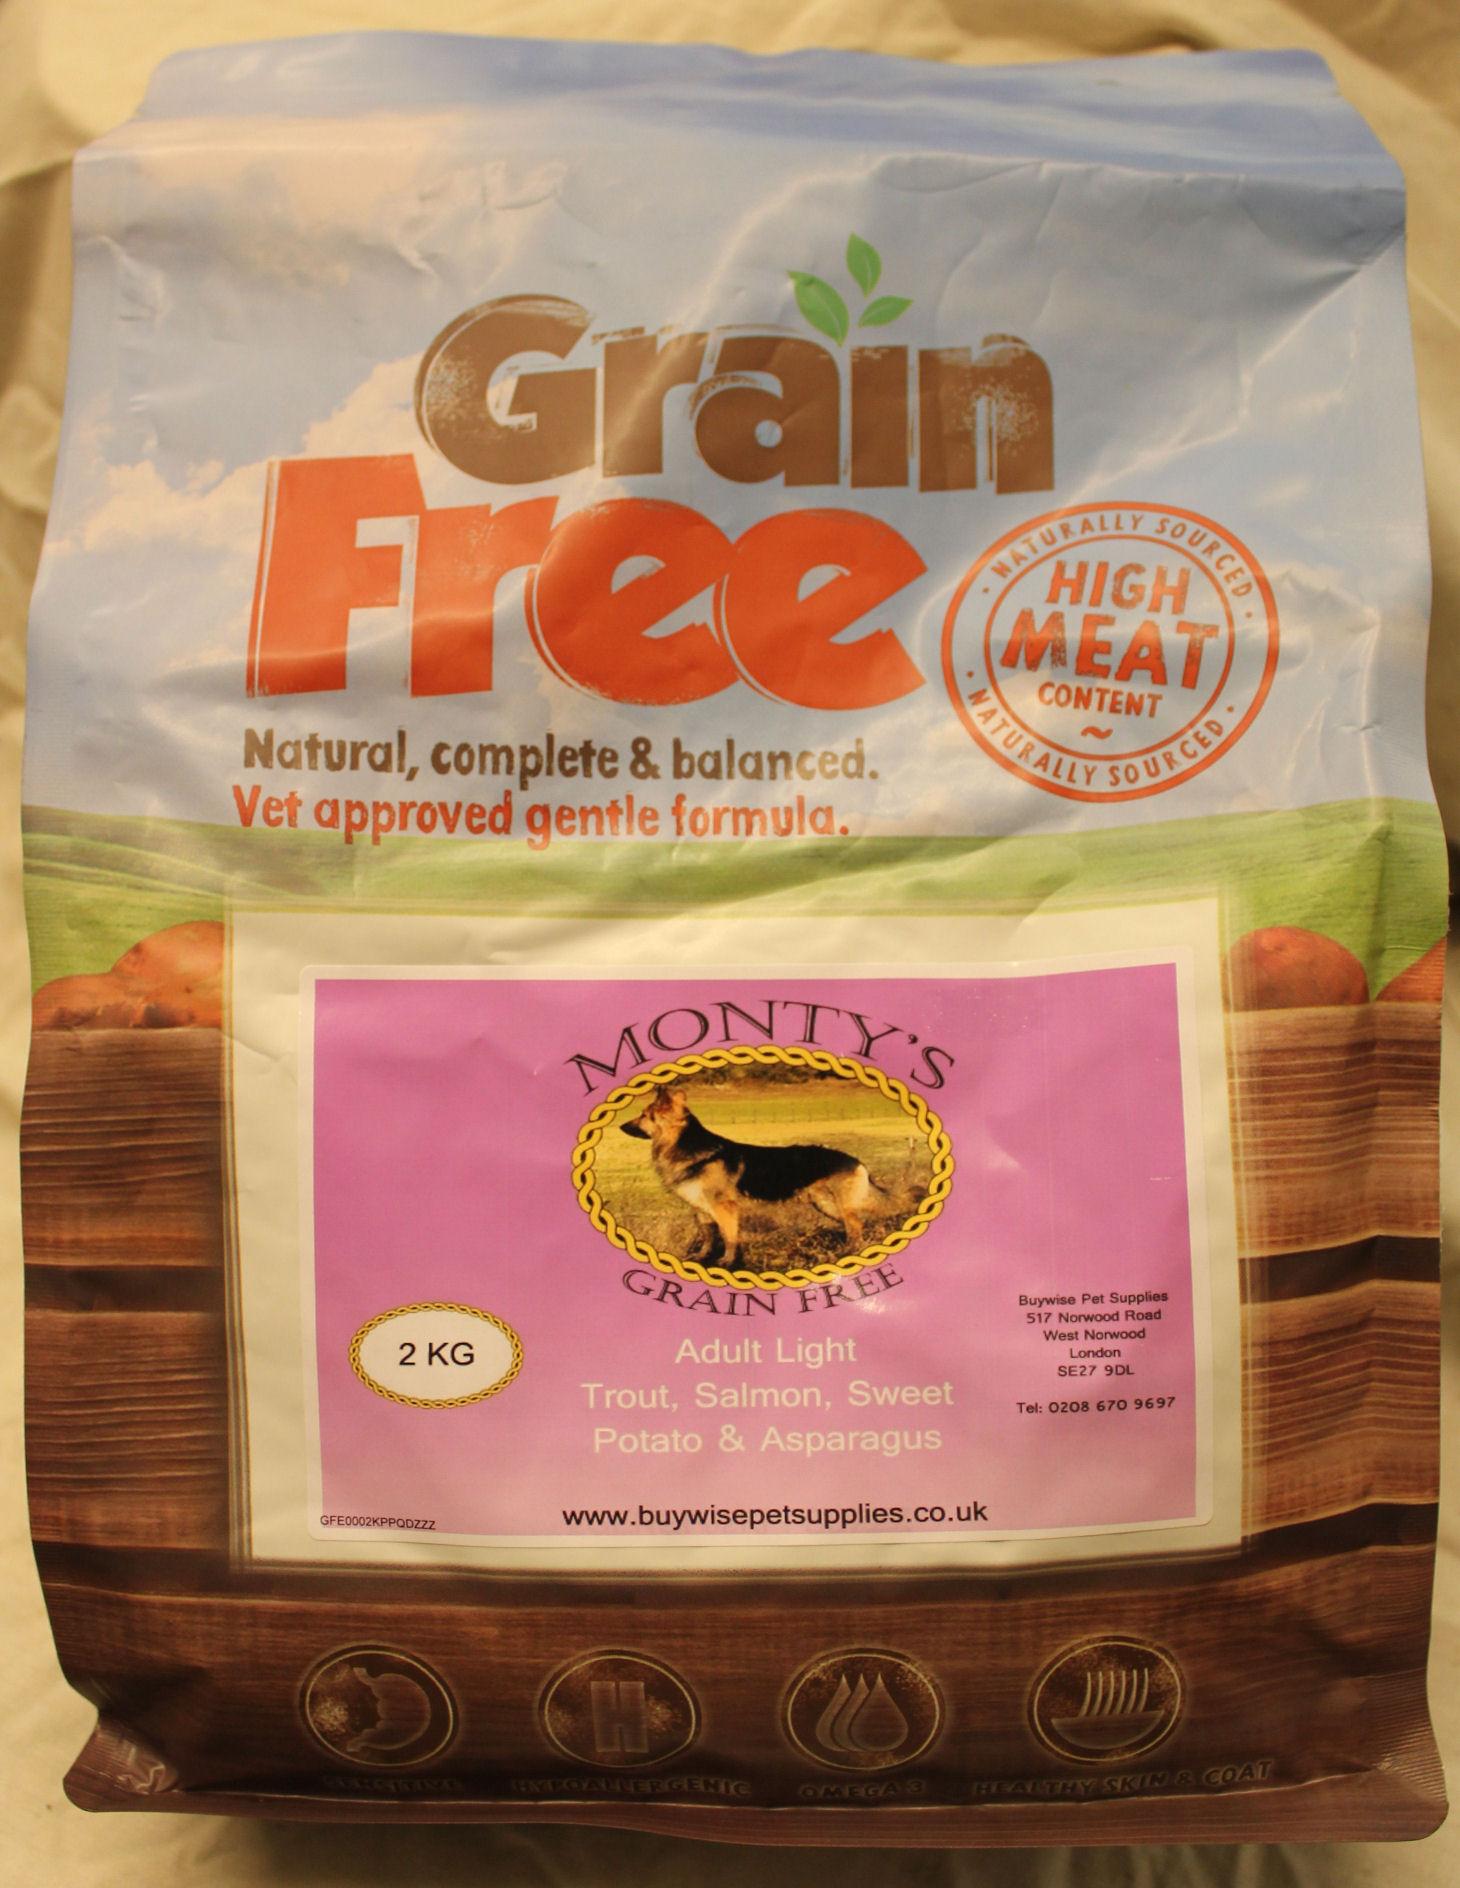 Montys Grain Free Adult Light Trout with Salmon, Sweet Potato & Asparagus 2kg